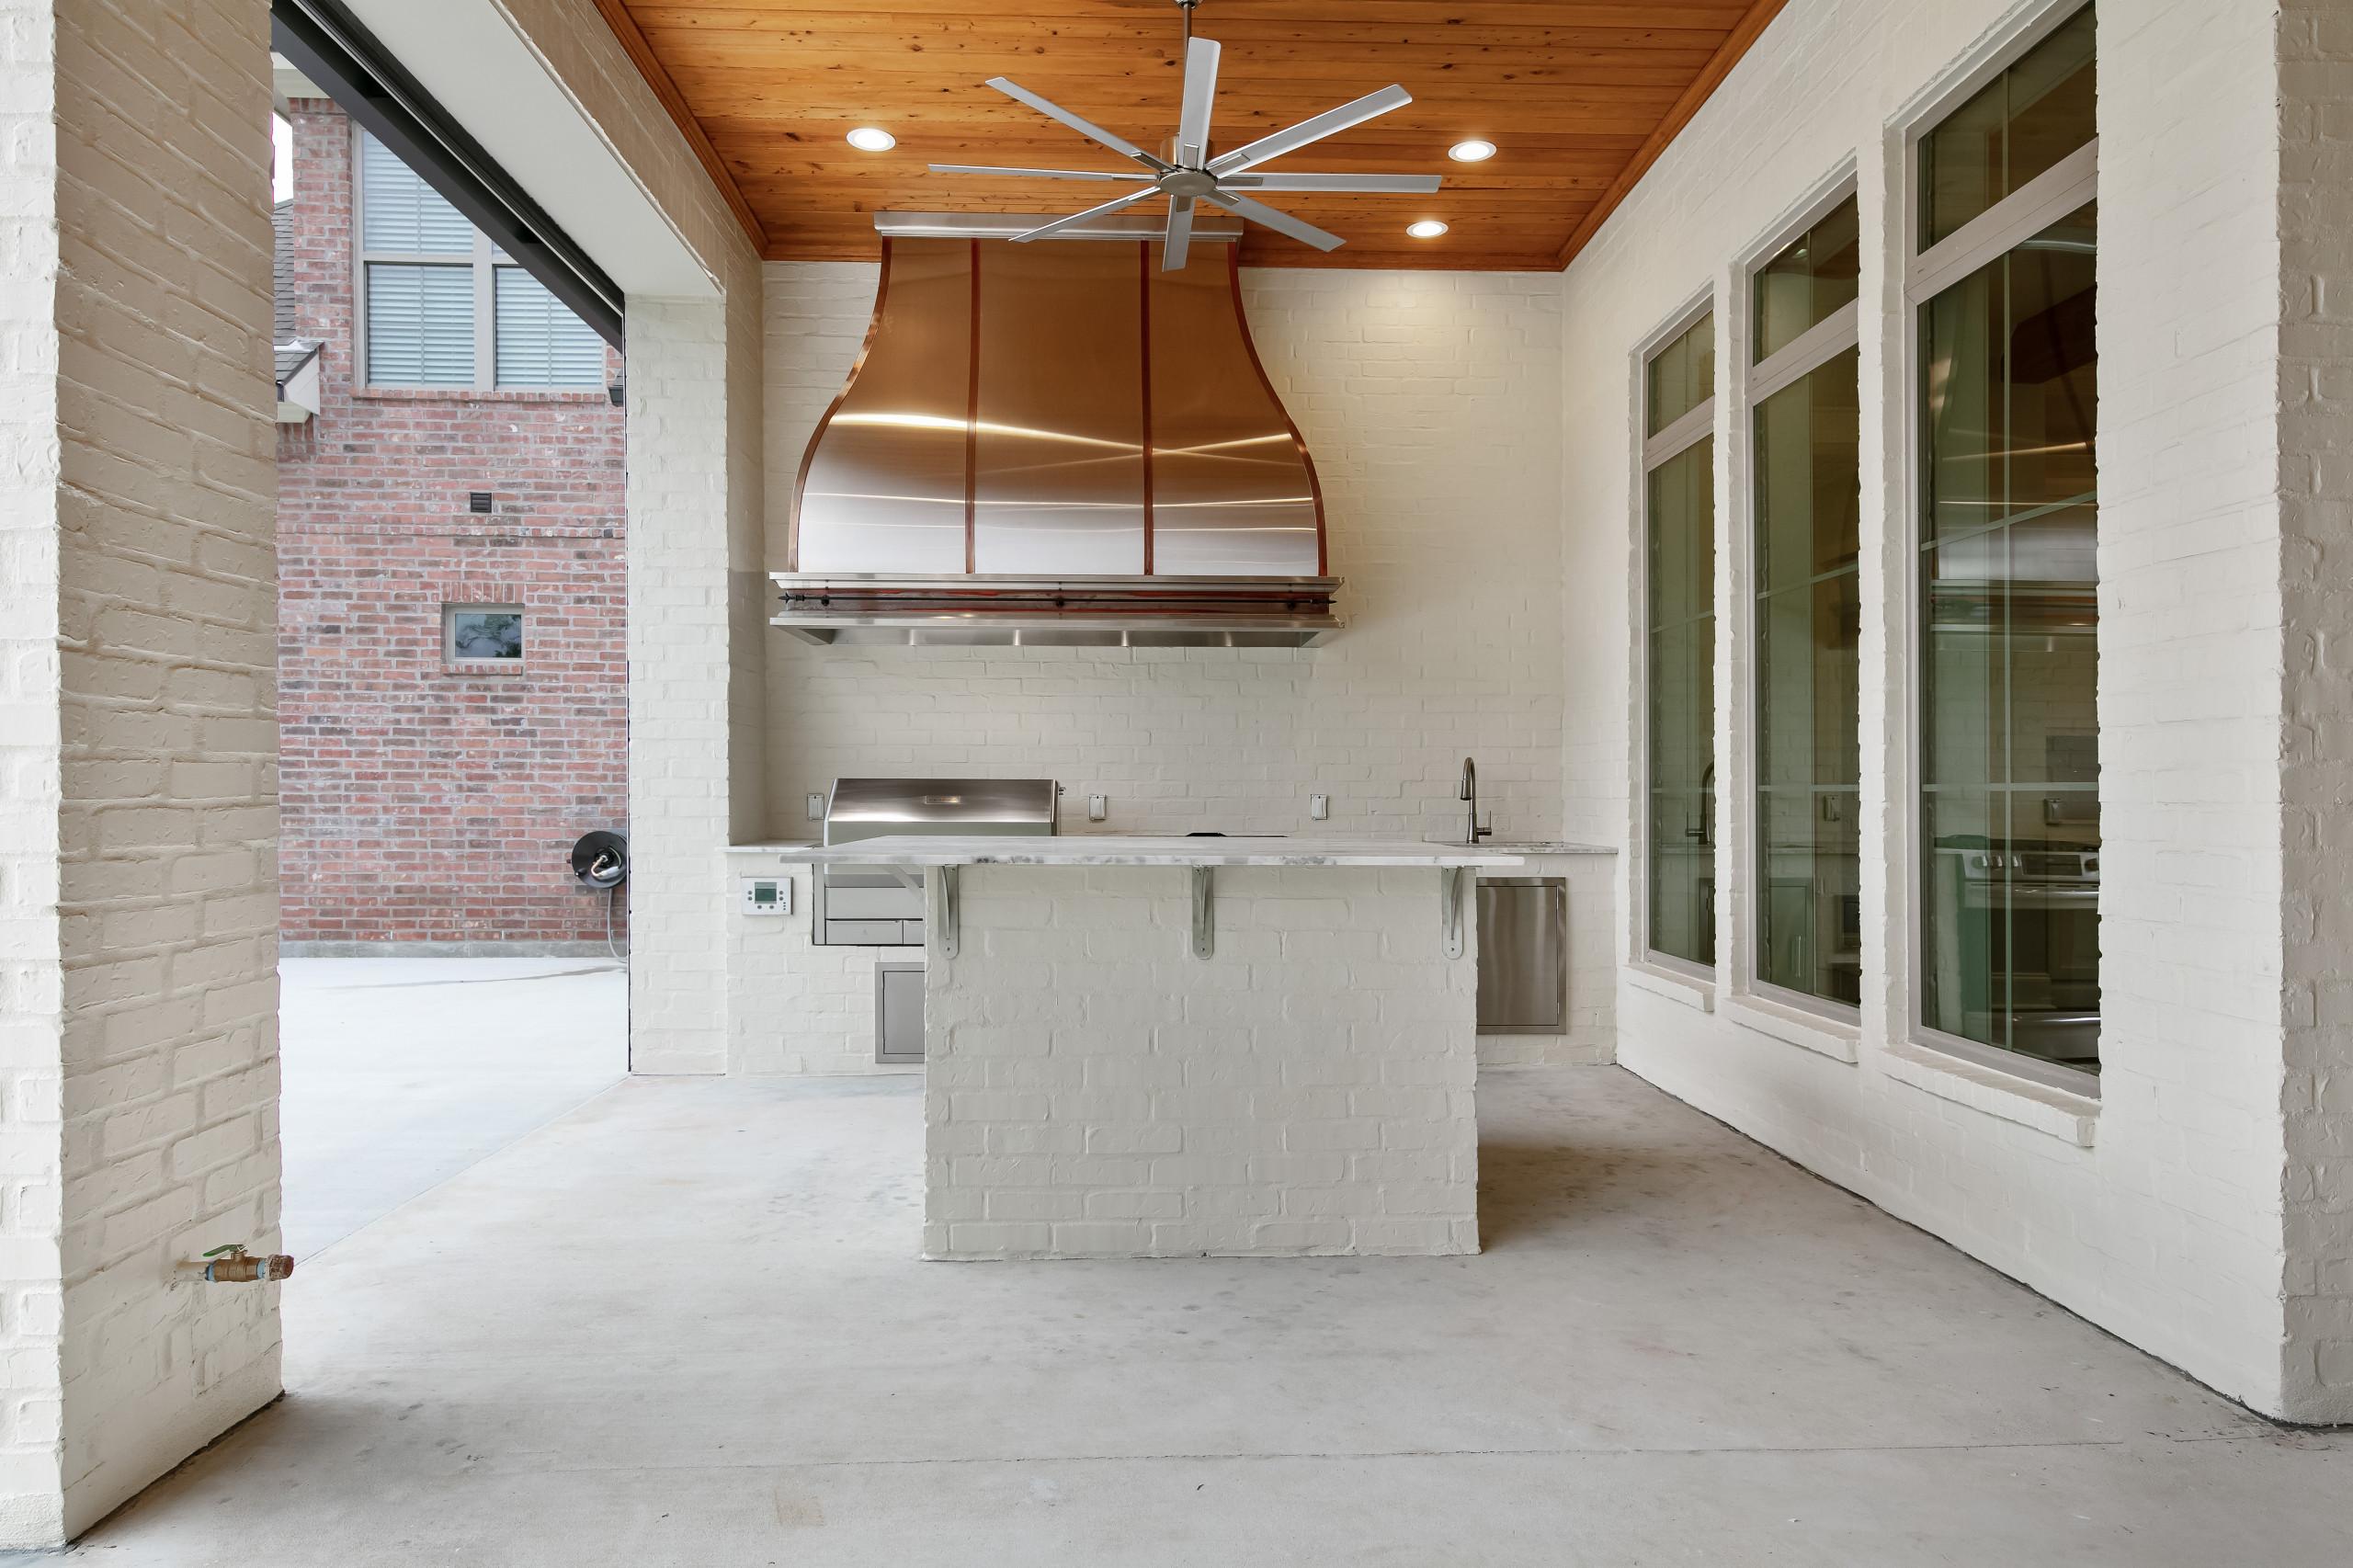 Gallery-Venable Residence